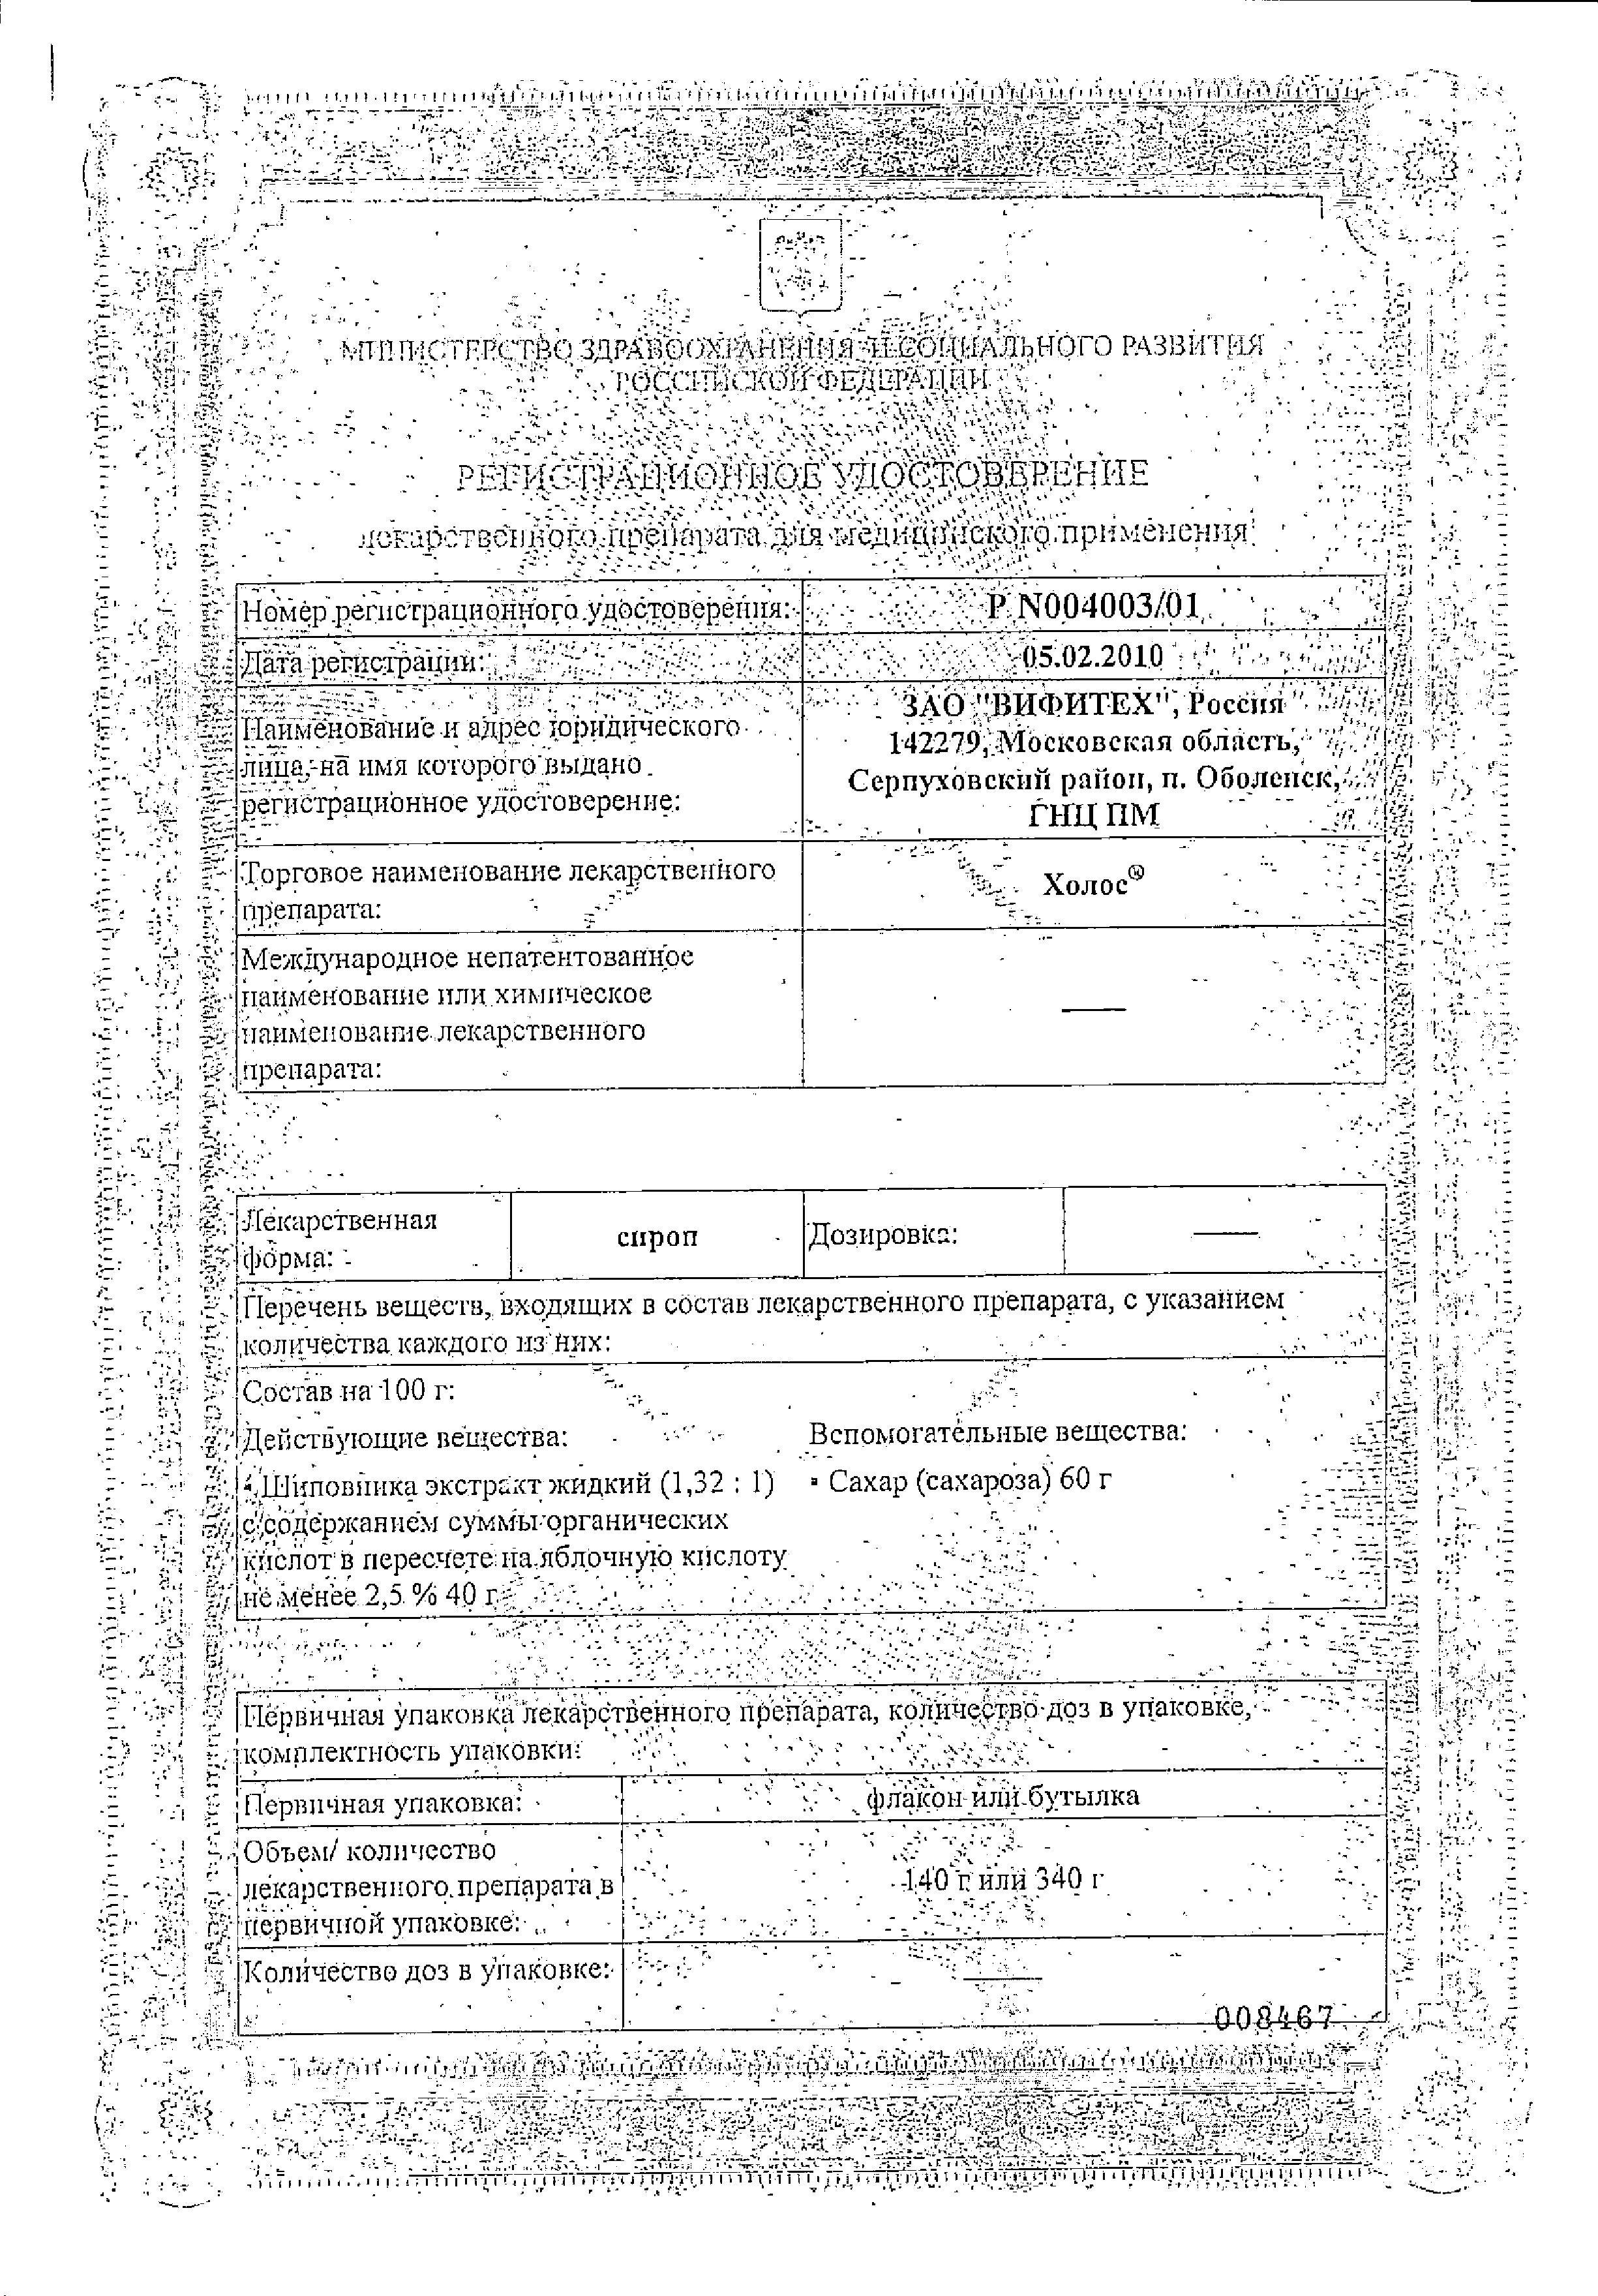 Холос сертификат